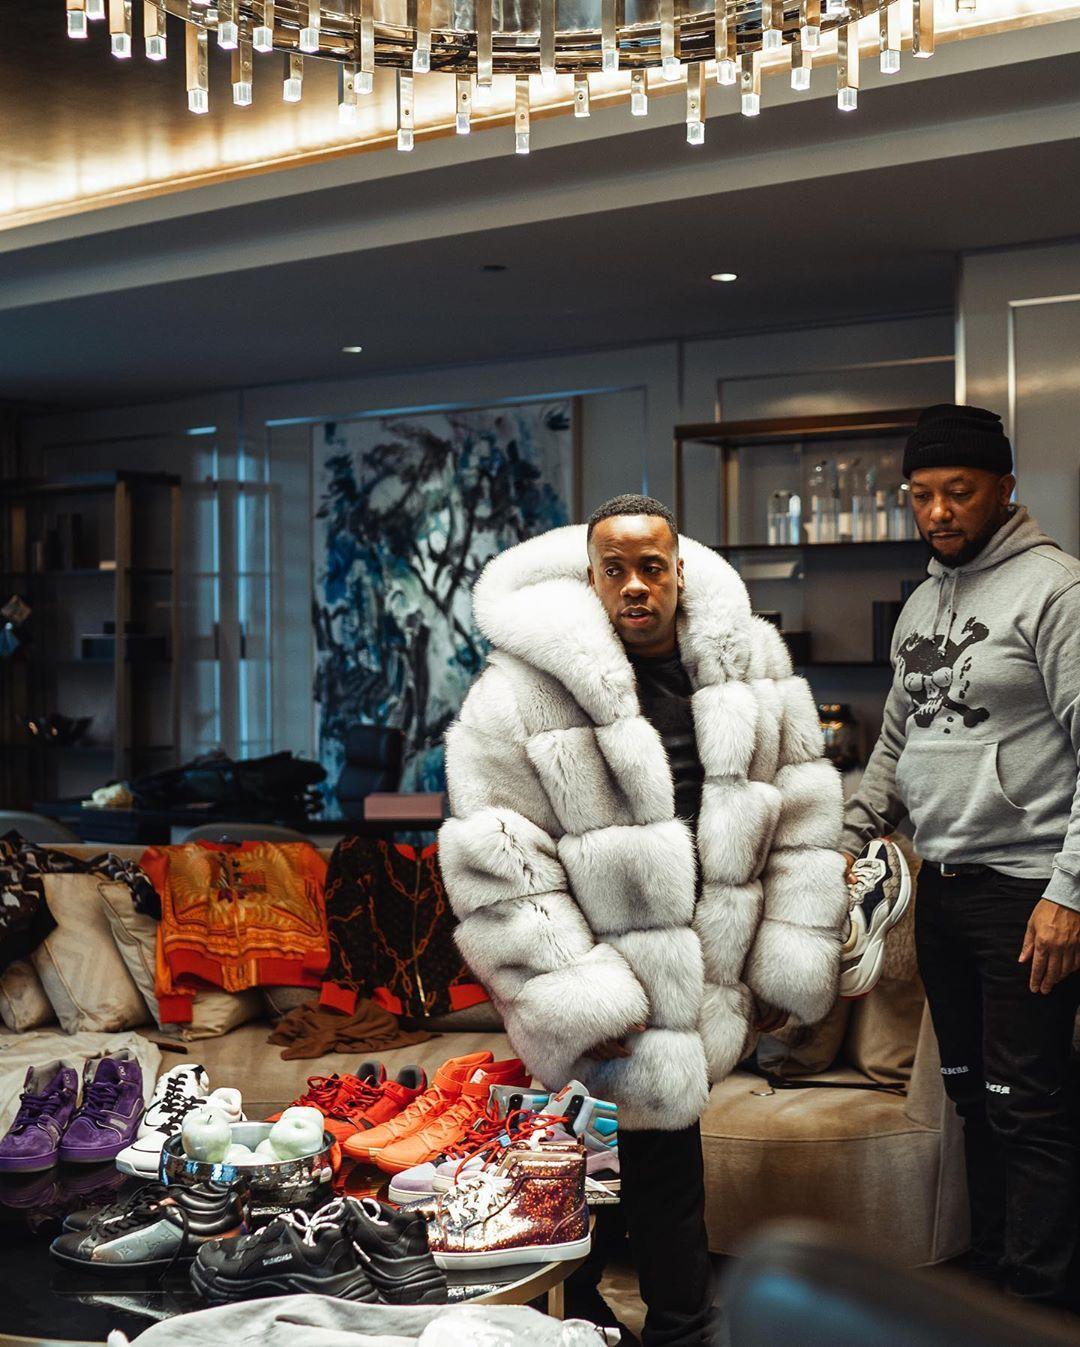 Yo Gotti On Instagram Expensive Habits Pickin Thru My Drip For Chicago Untrapped Knowurworth Fur Hood Coat Coat Fur Hood